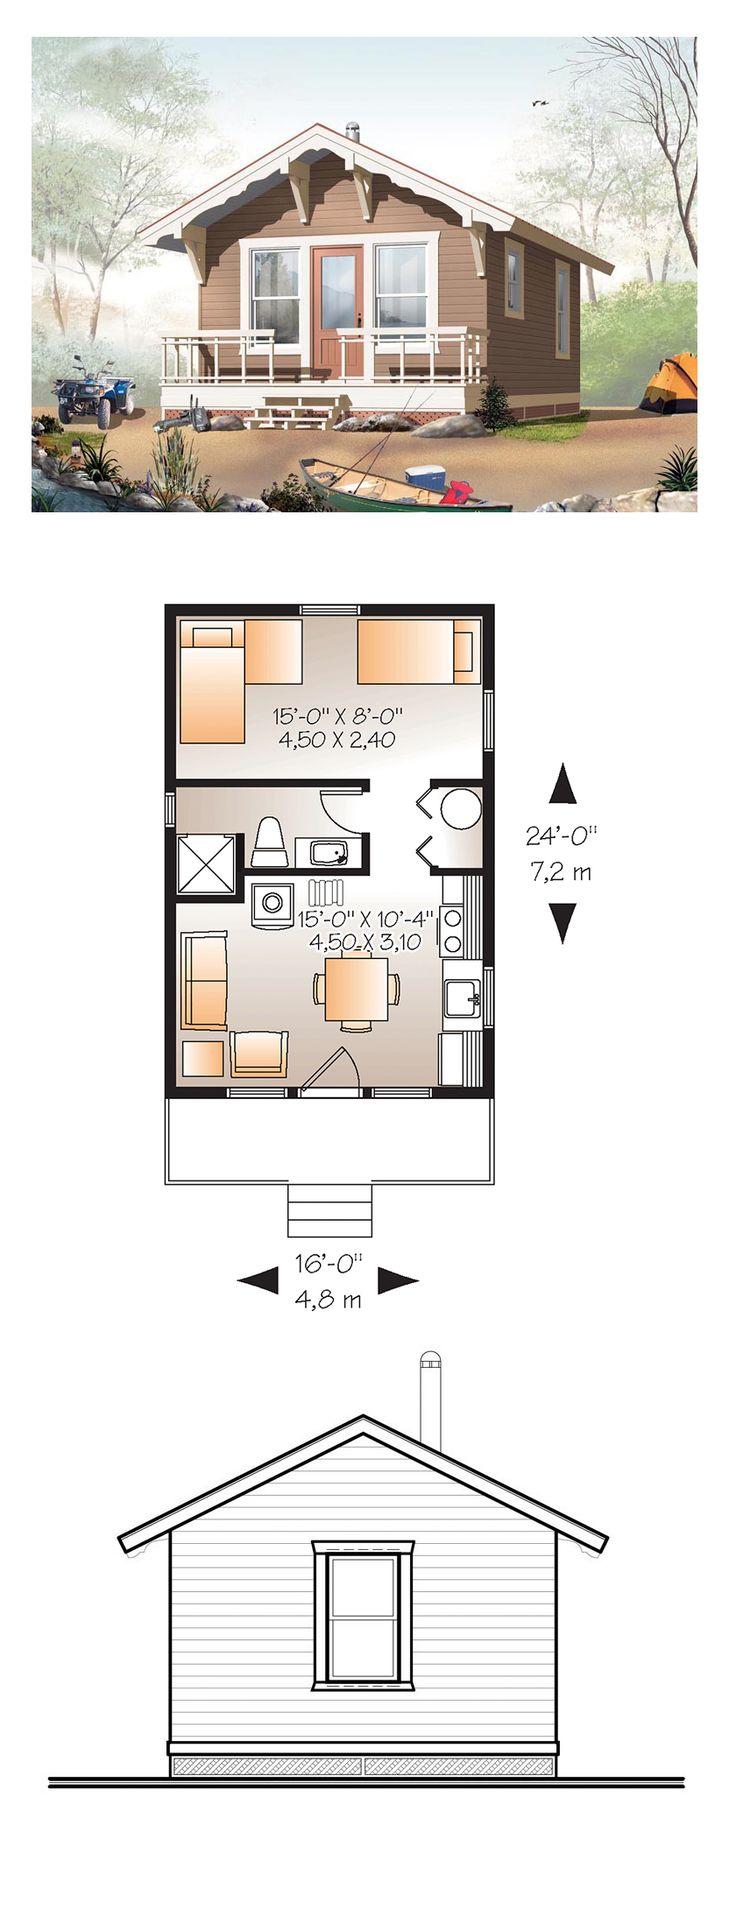 Cabin house plan 76164